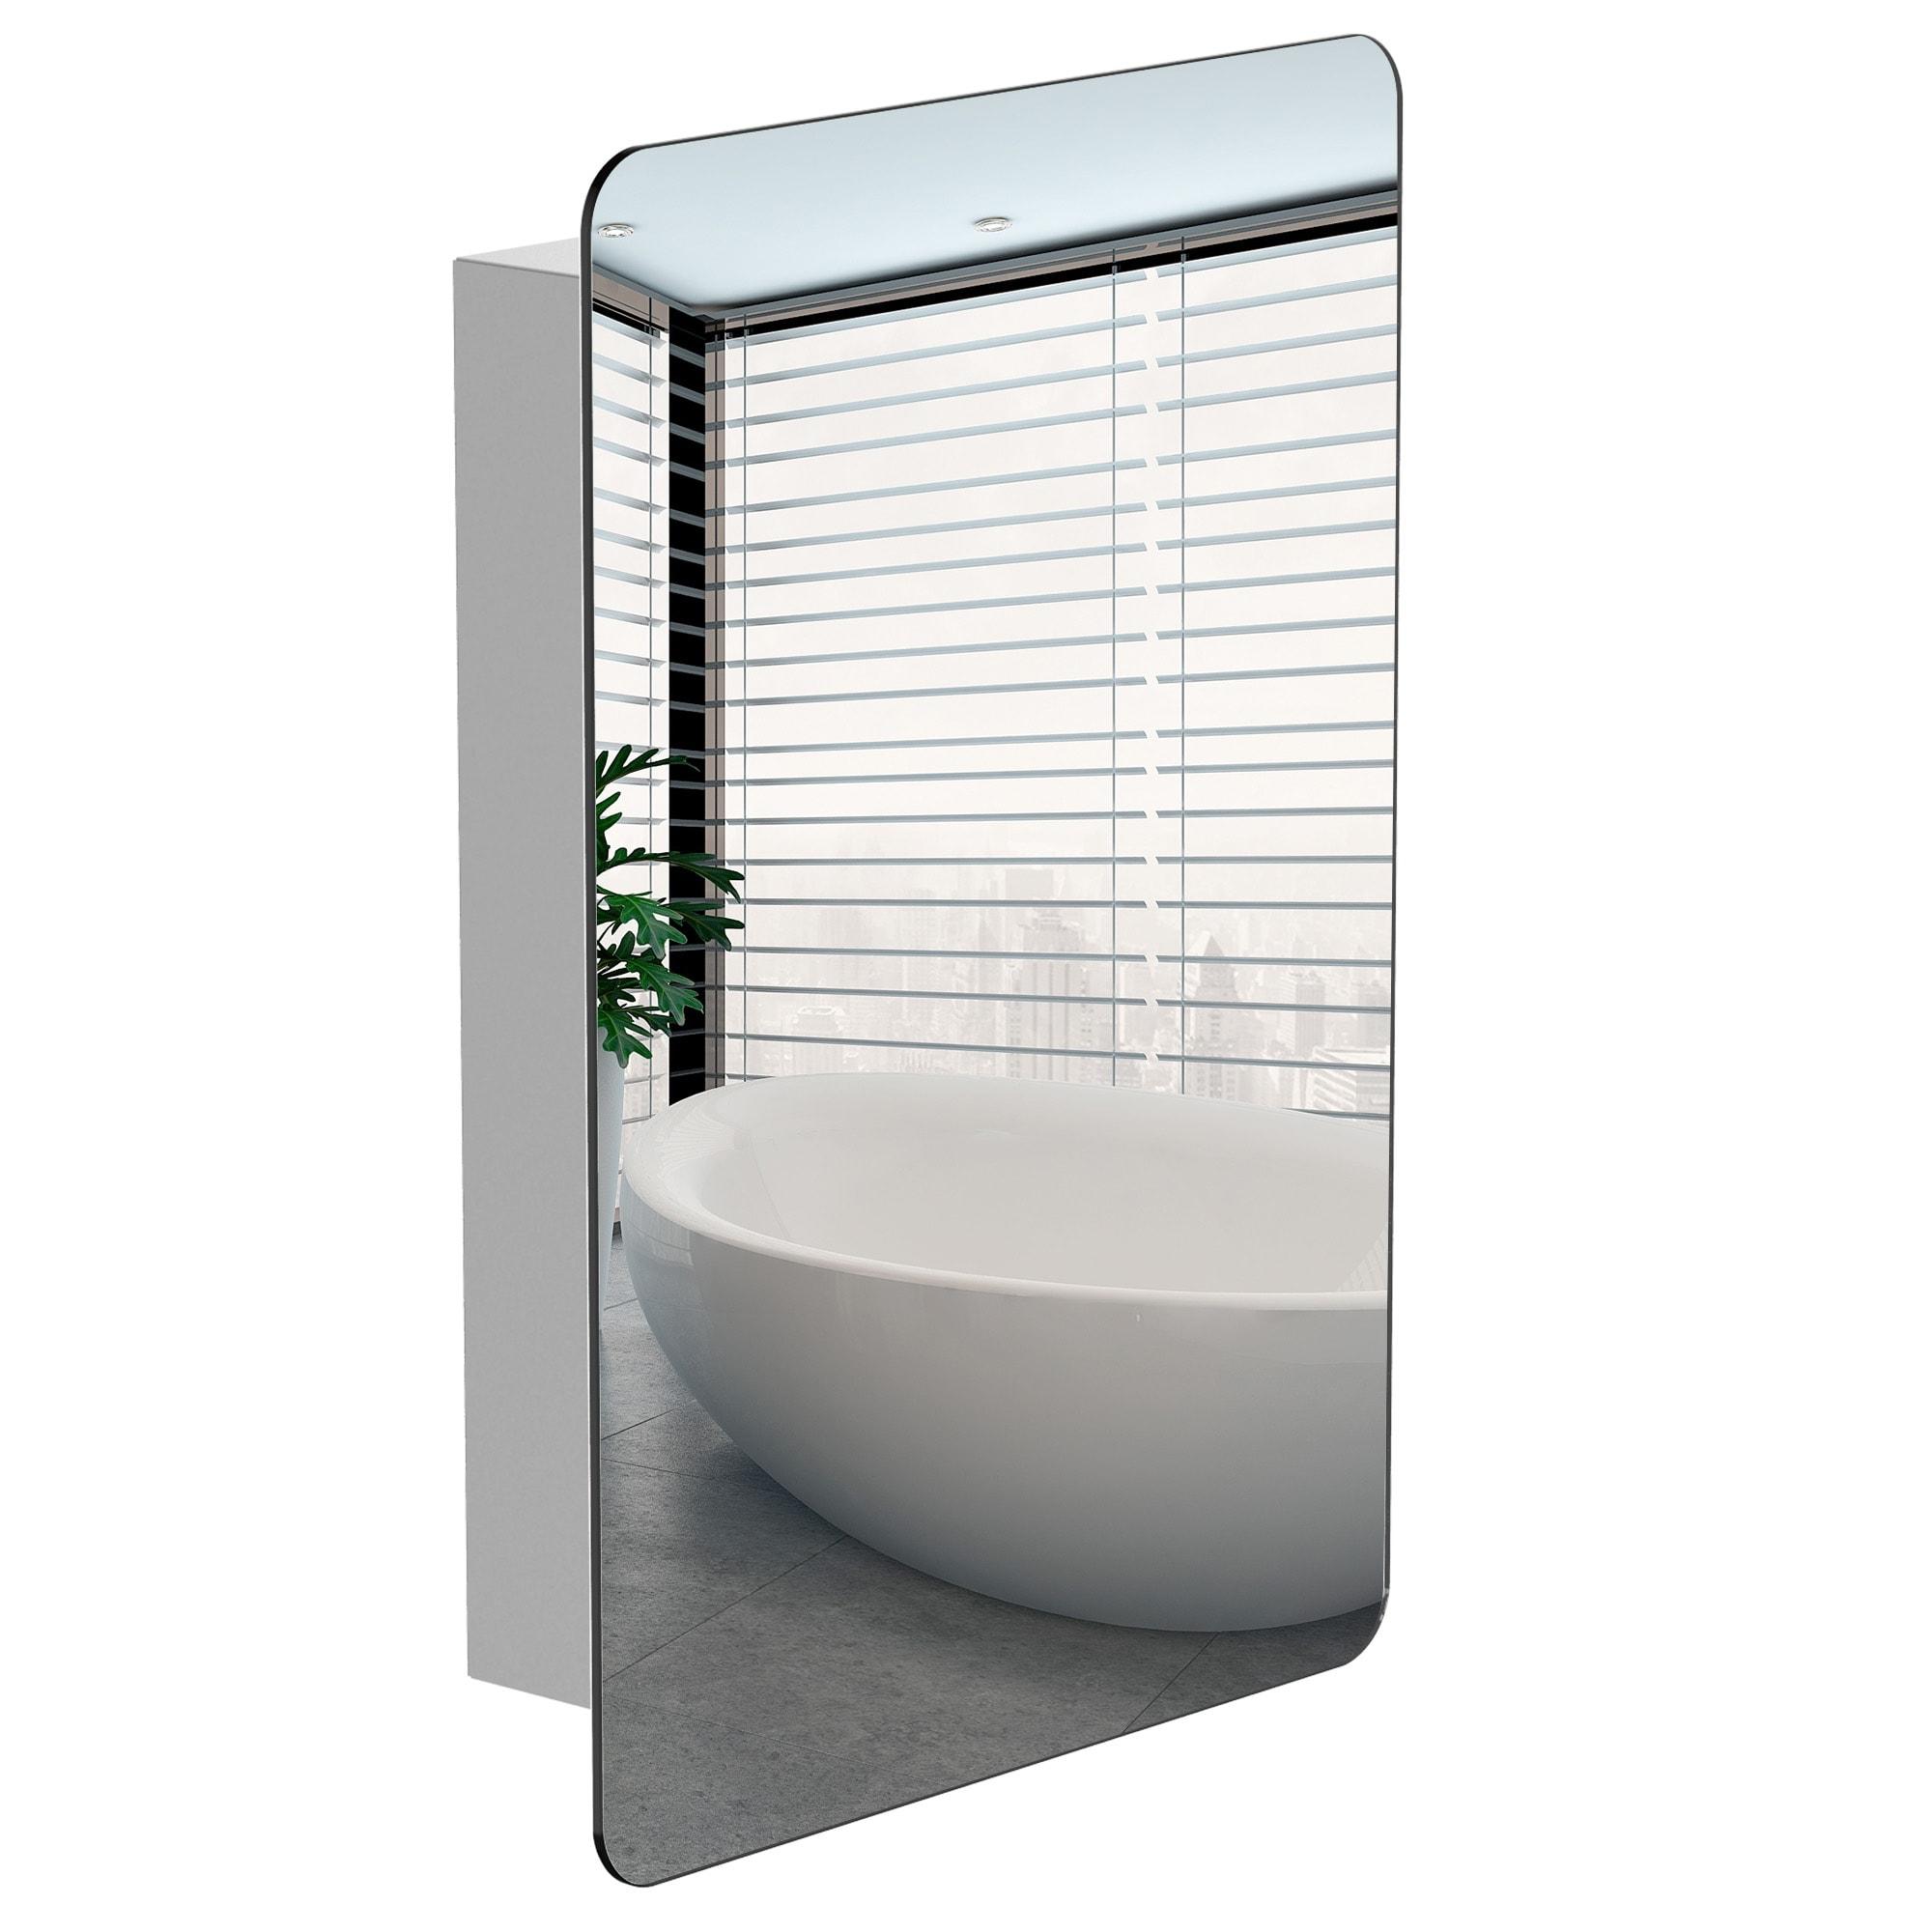 Kleankin 18 X 26 46cm X 66cm Wall Mount Bathroom Medicine Cabinet Mirror Sliding Door With 3 Tier Storage Shelf On Sale Overstock 32200887